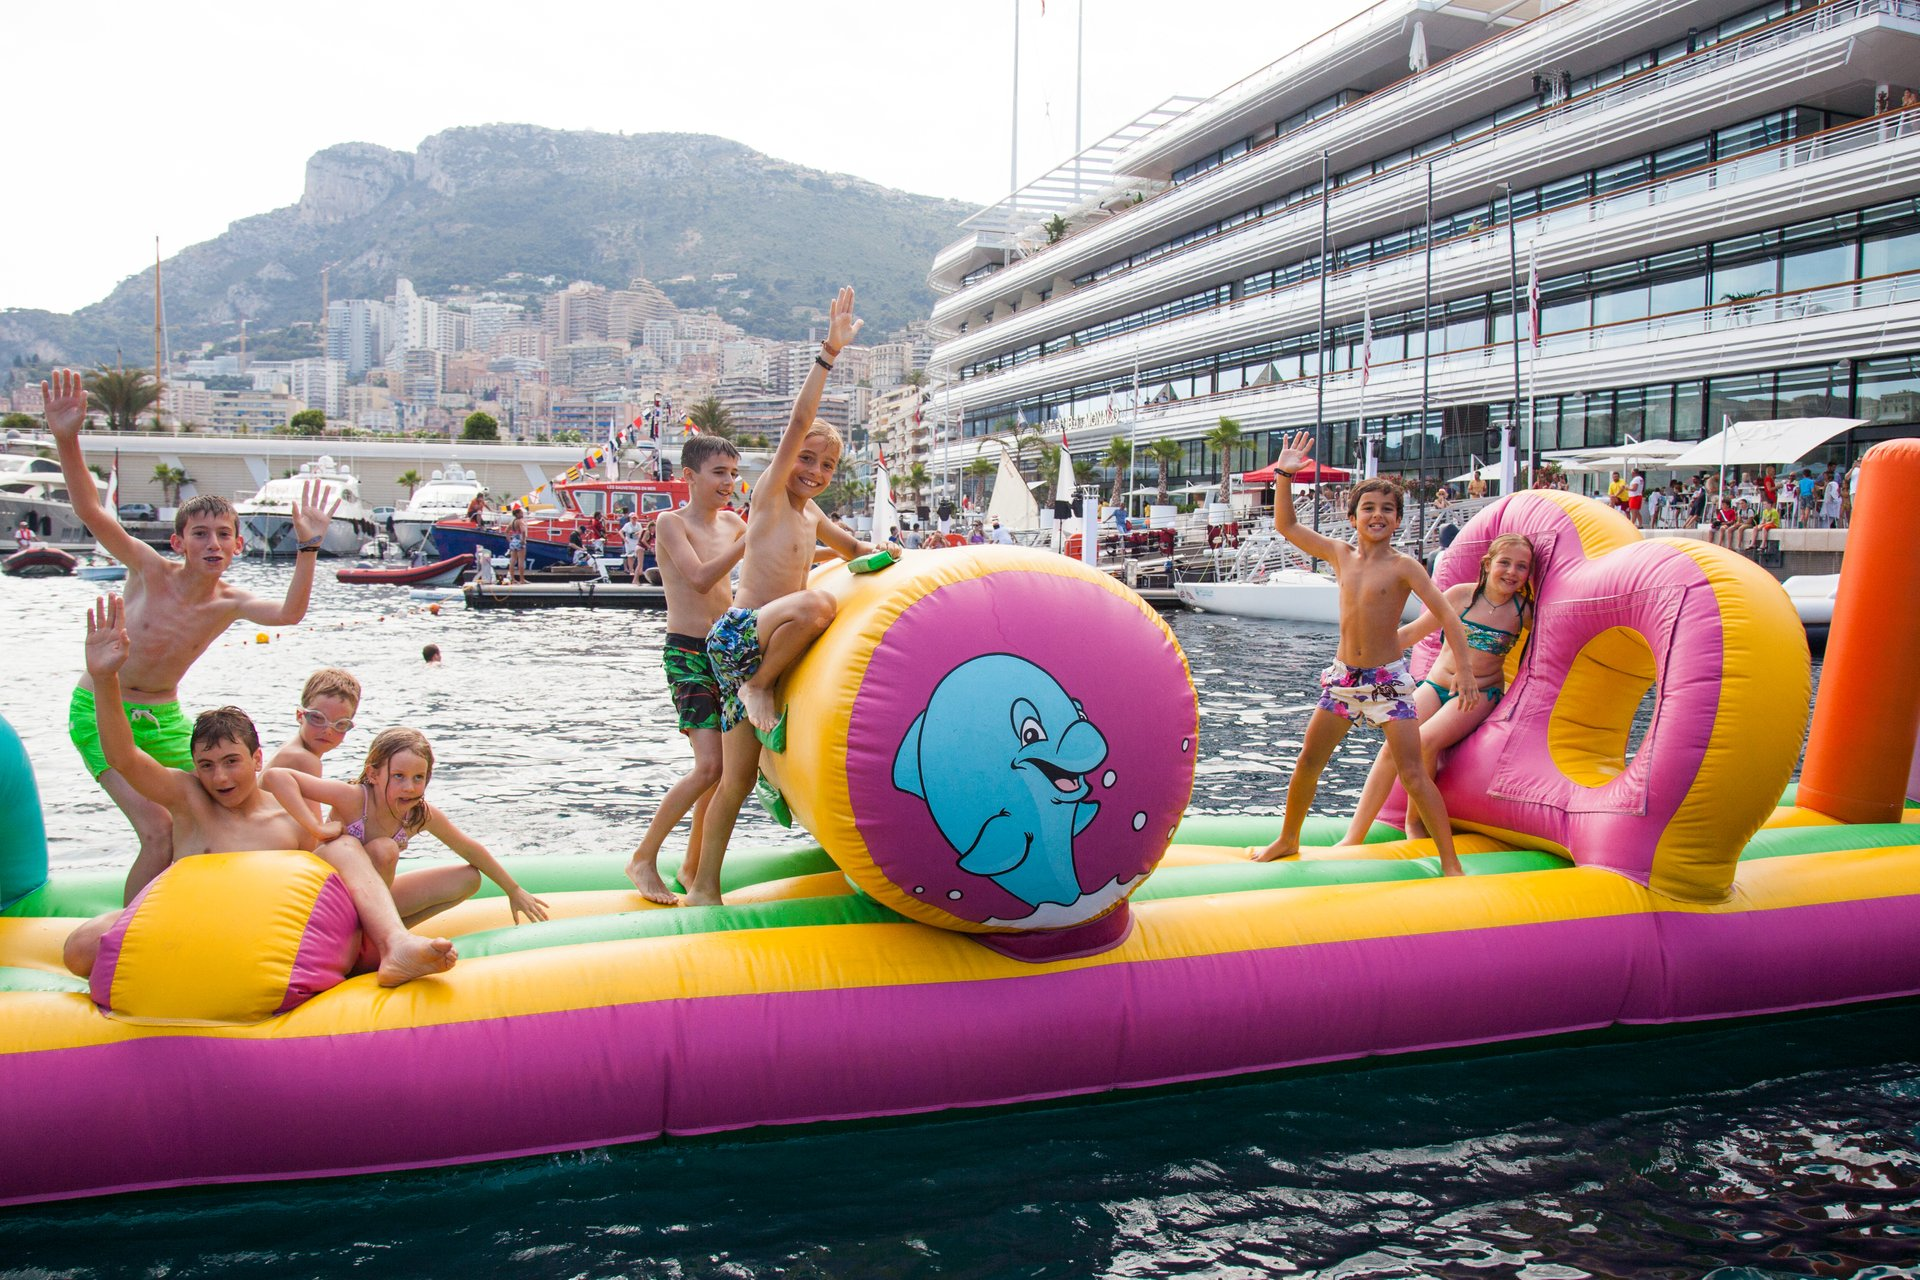 Best time to see Fête de la Mer (Festival of the Sea)